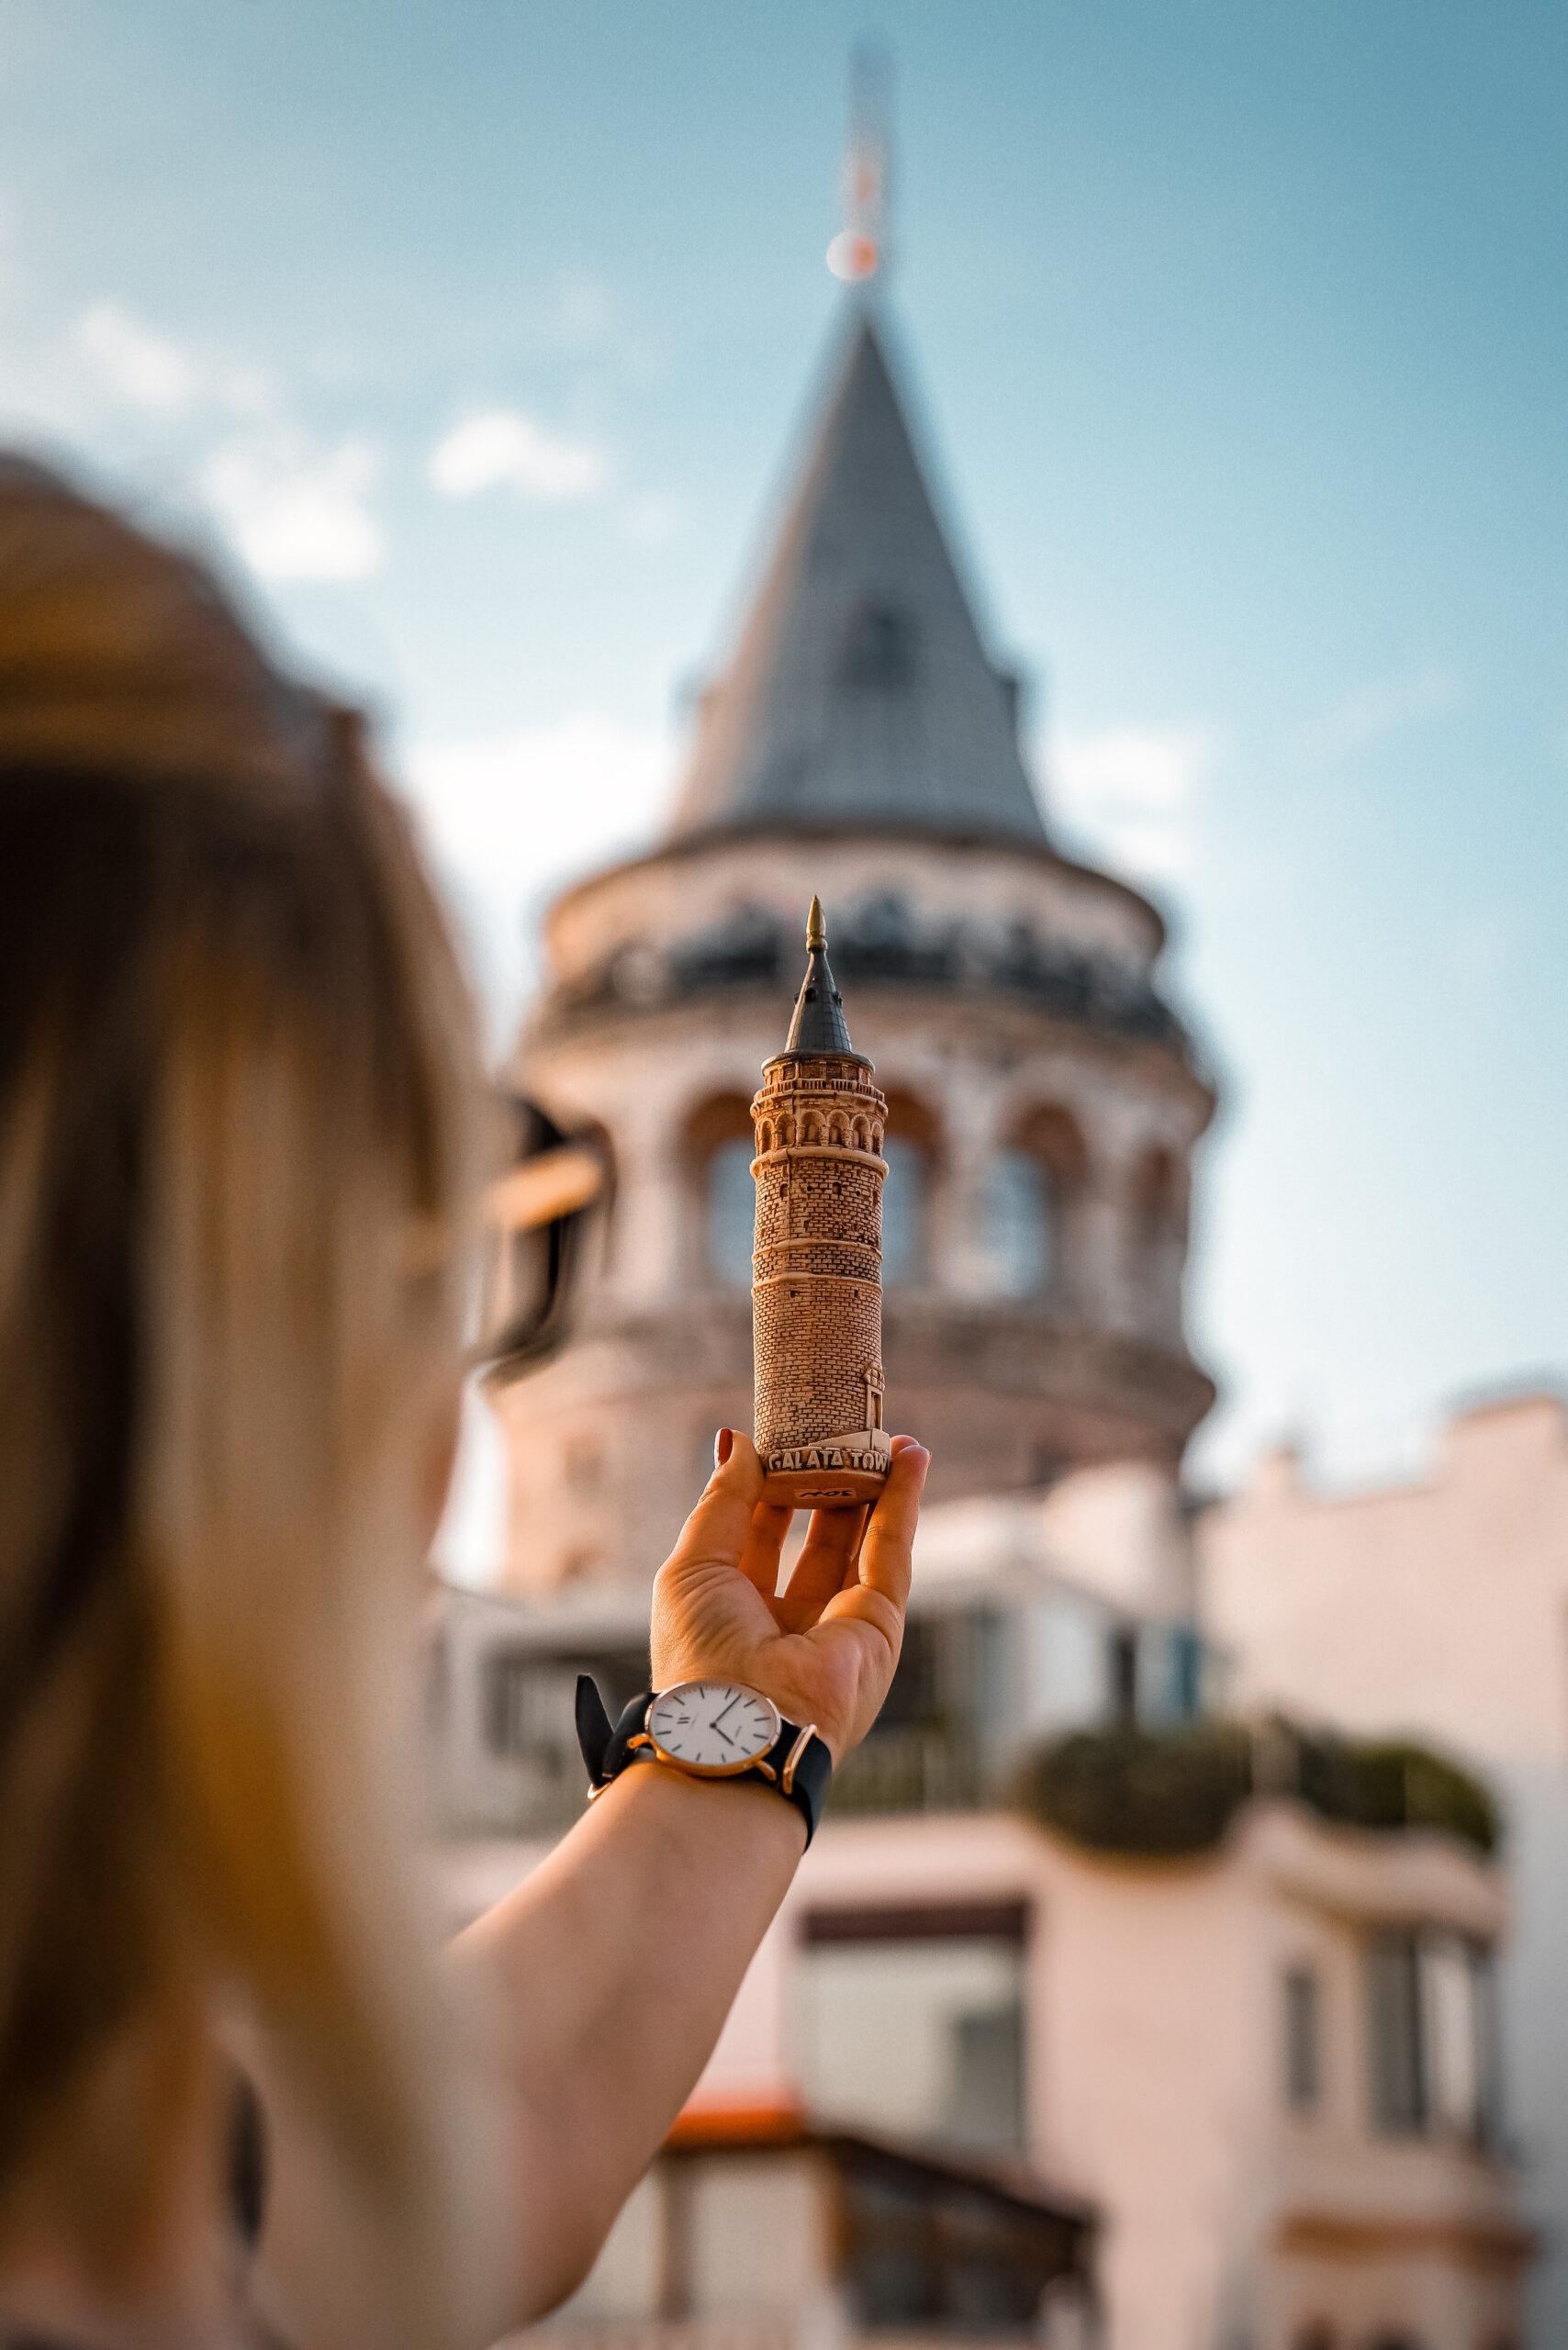 https://www.tourbulance.com.tr/wp-content/uploads/2021/03/Istanbul2-scaled.jpg